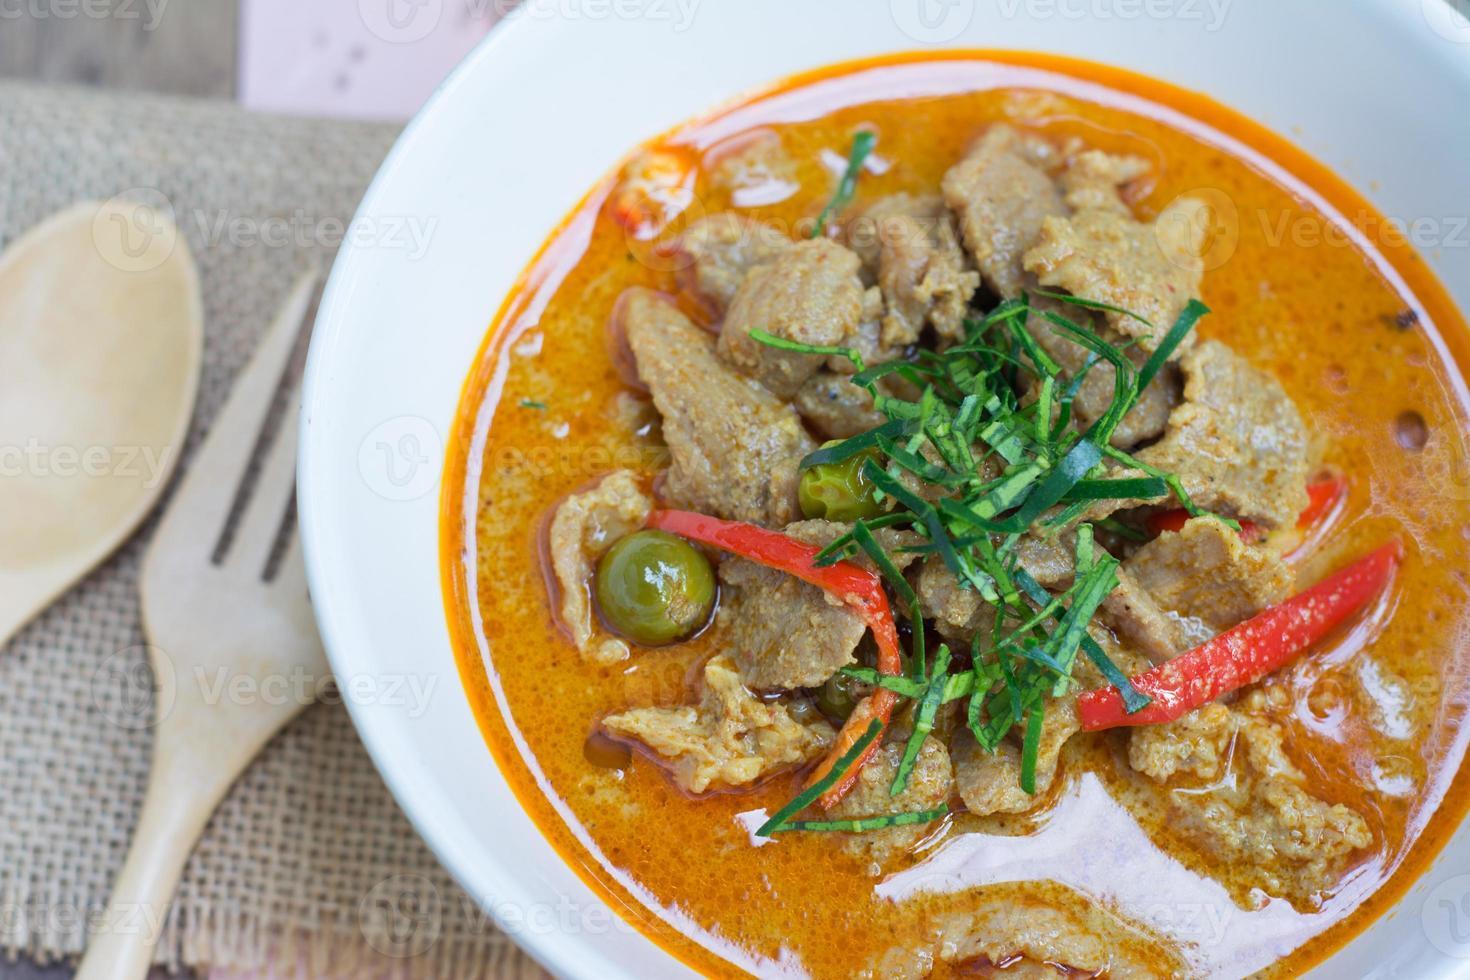 caril saboroso com carne de porco (nome de comida tailandesa panang) foto